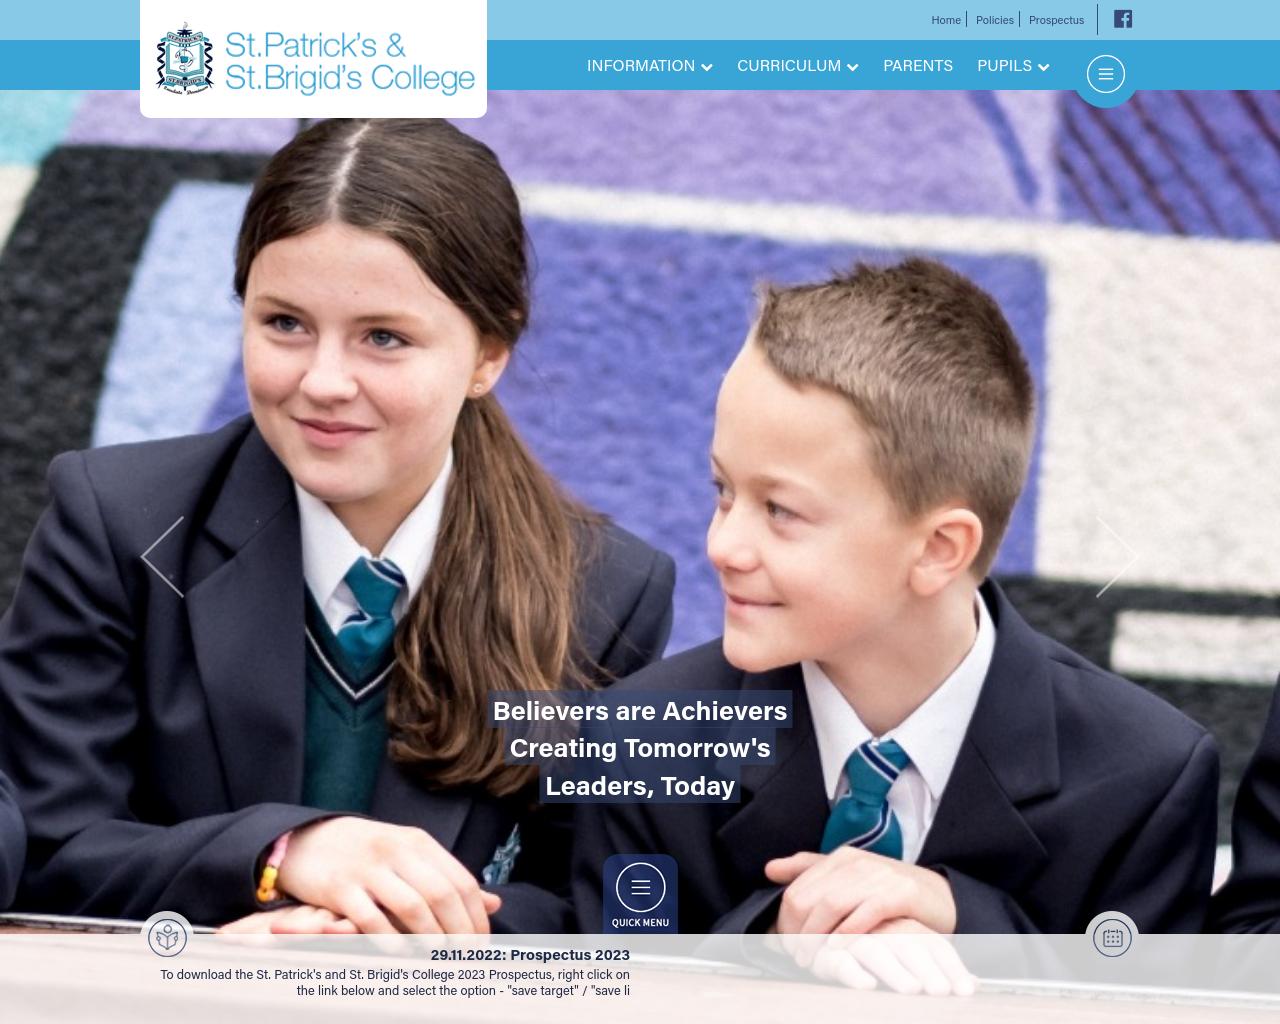 St. Patrick's and St. Brigid's College Website